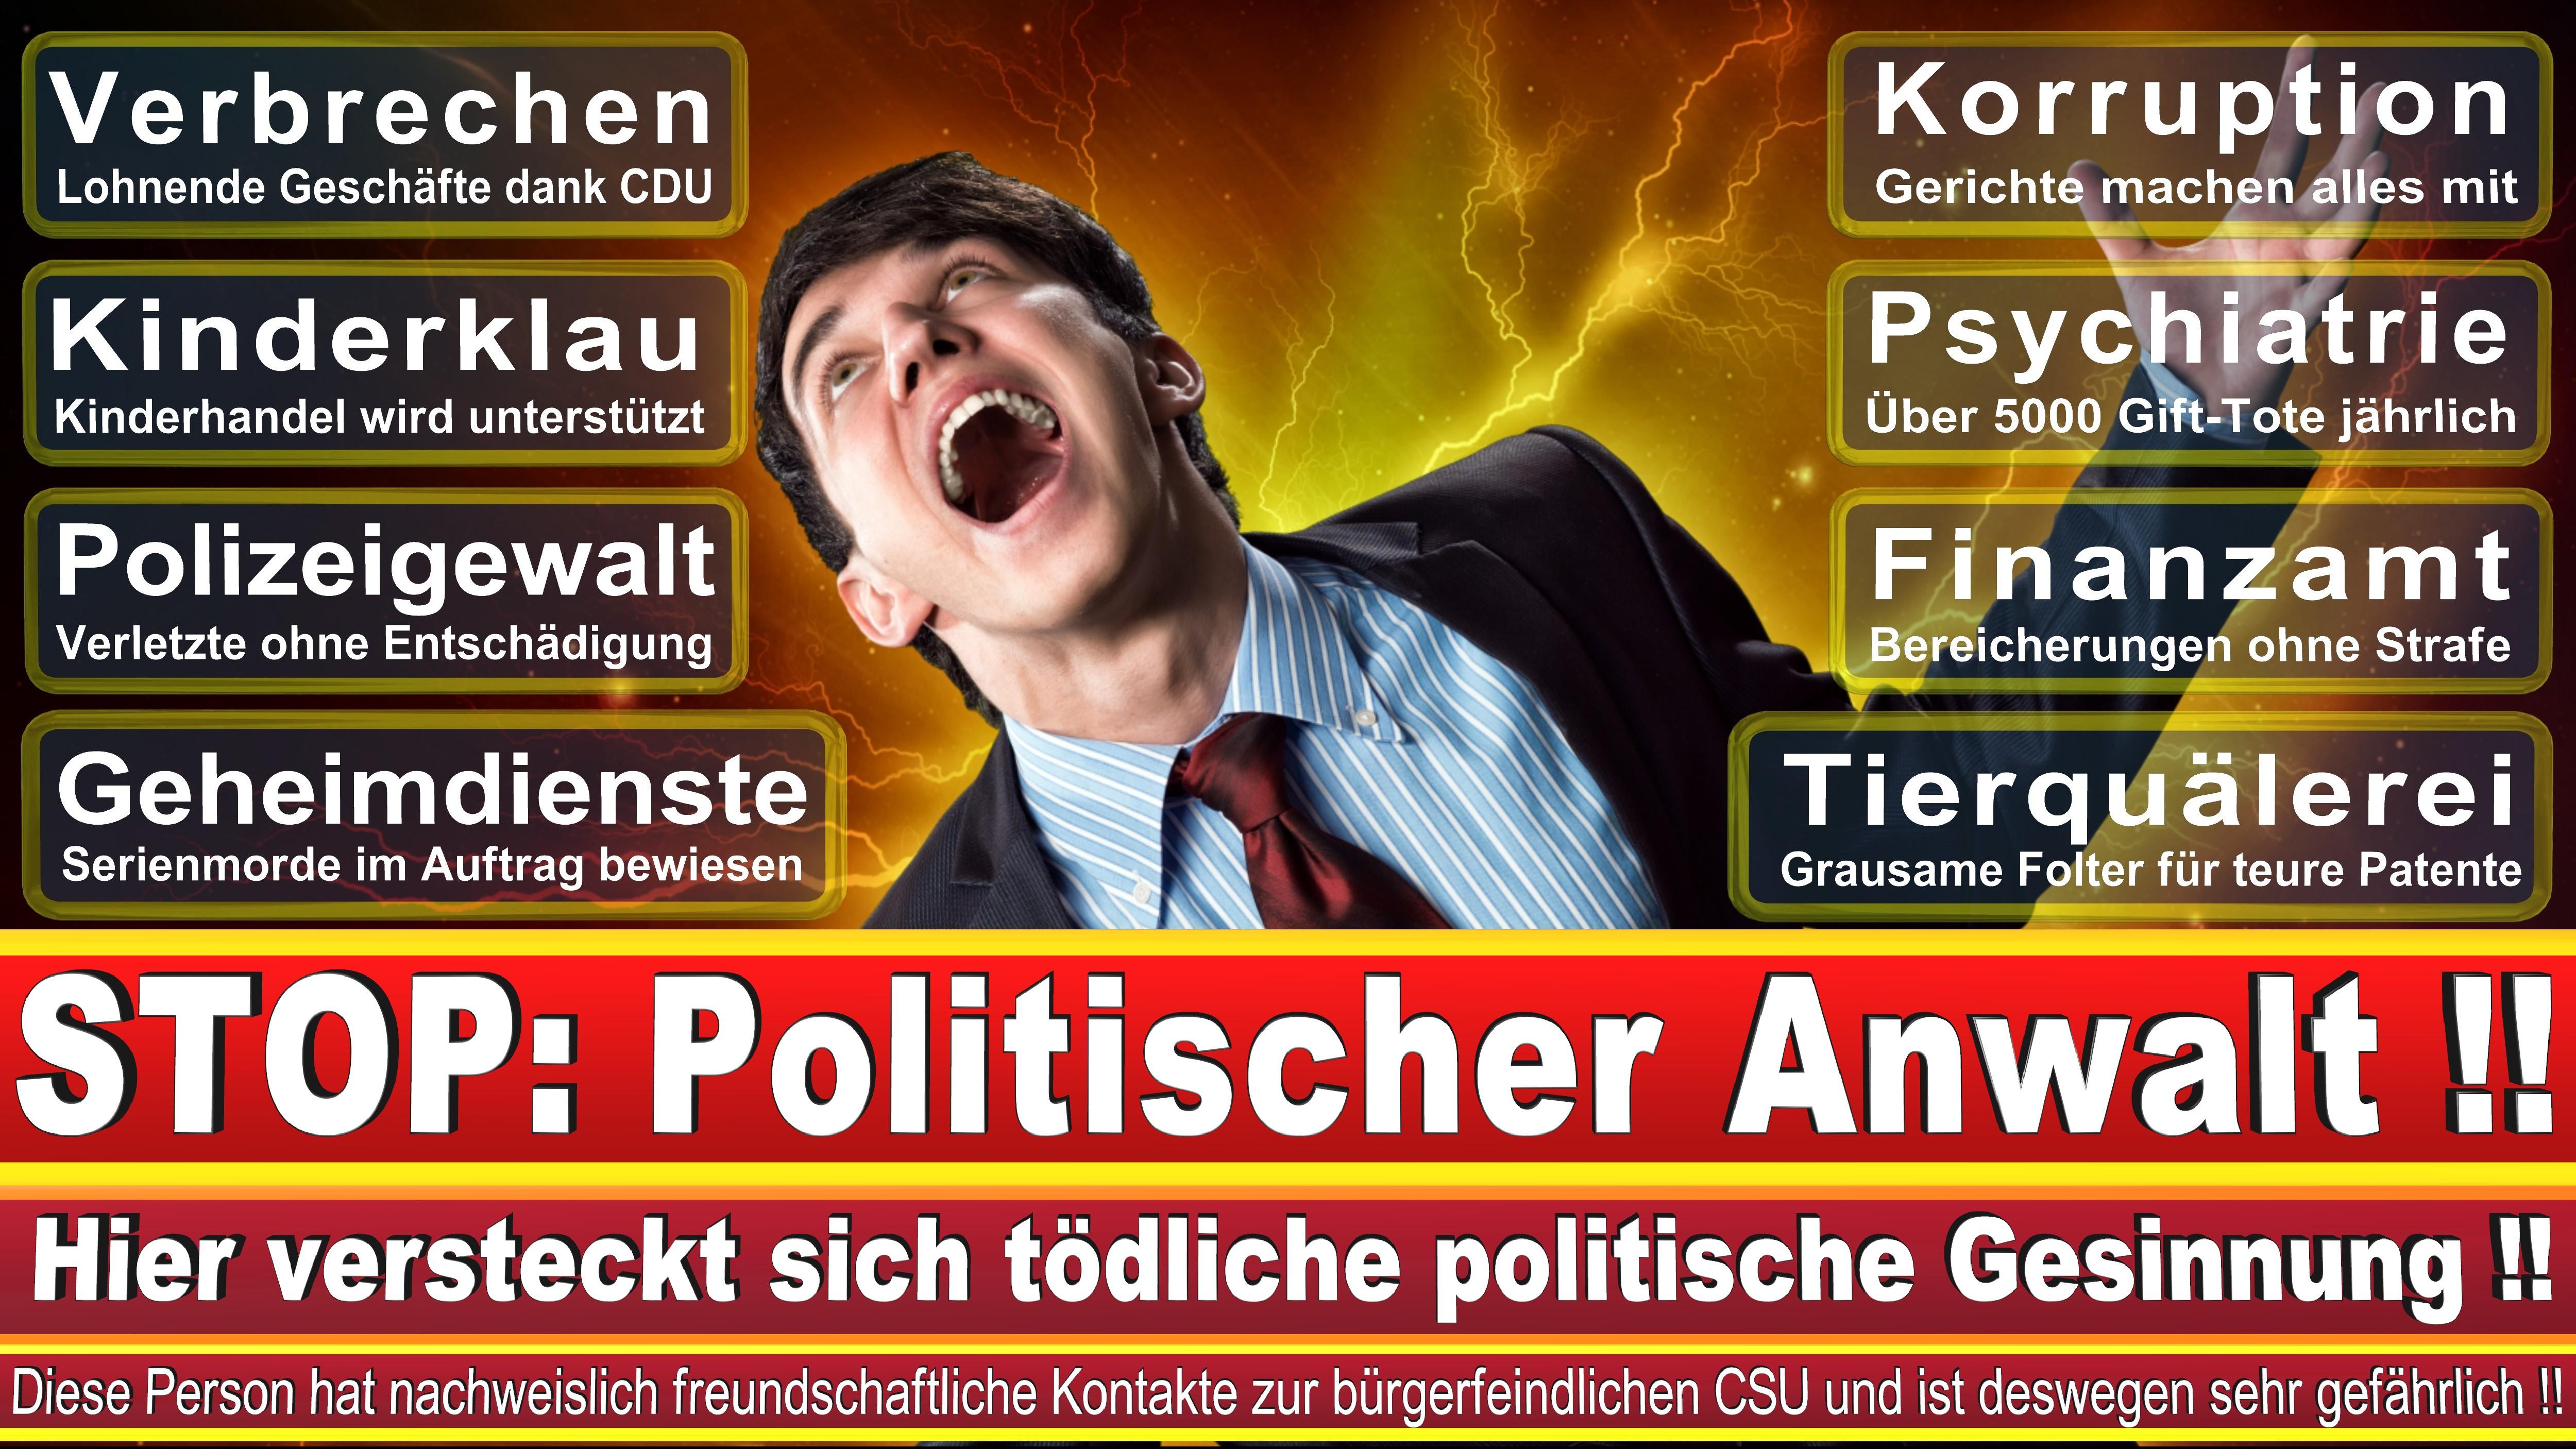 Rechtsanwältin Ute Maurer Nürnberg Rechtsanwältin Kanzlei Müller GbR 1